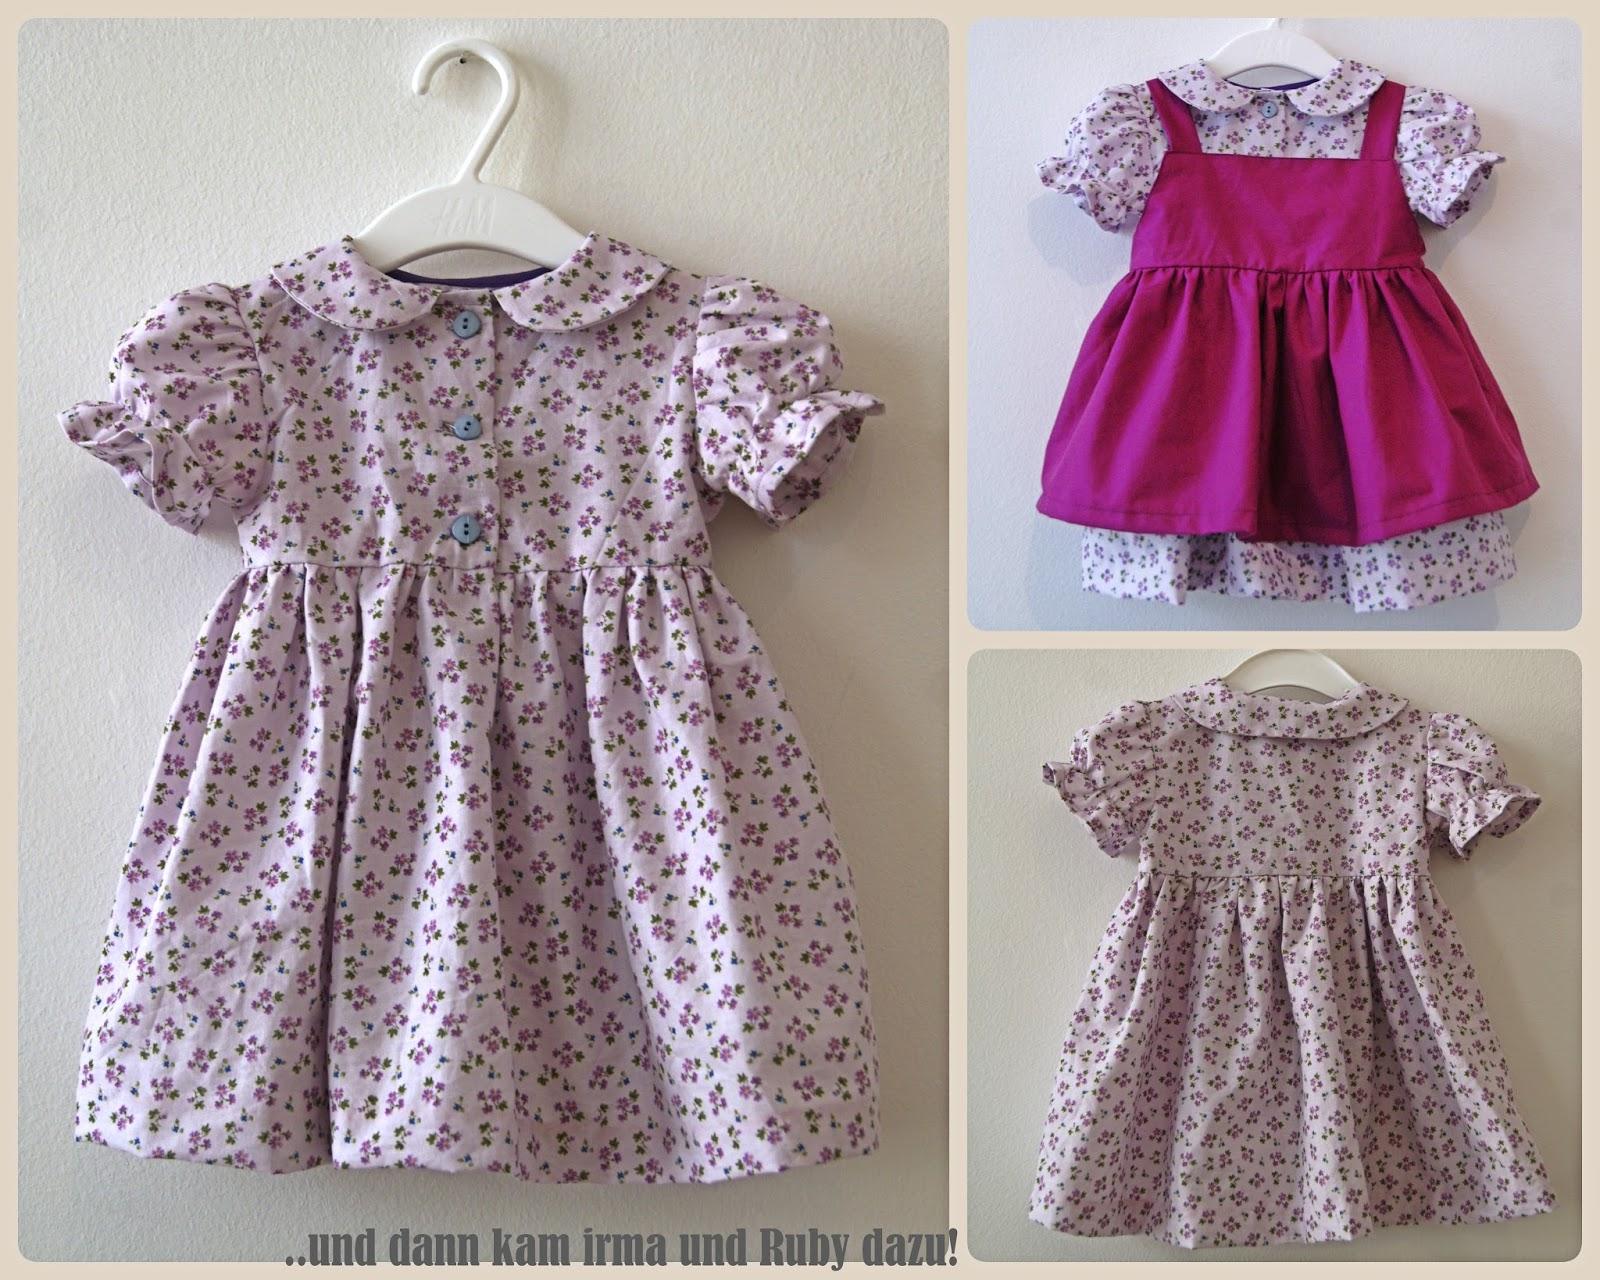 Berühmt Babykleid Schnittmuster Fotos - Strickmuster-Ideen ...